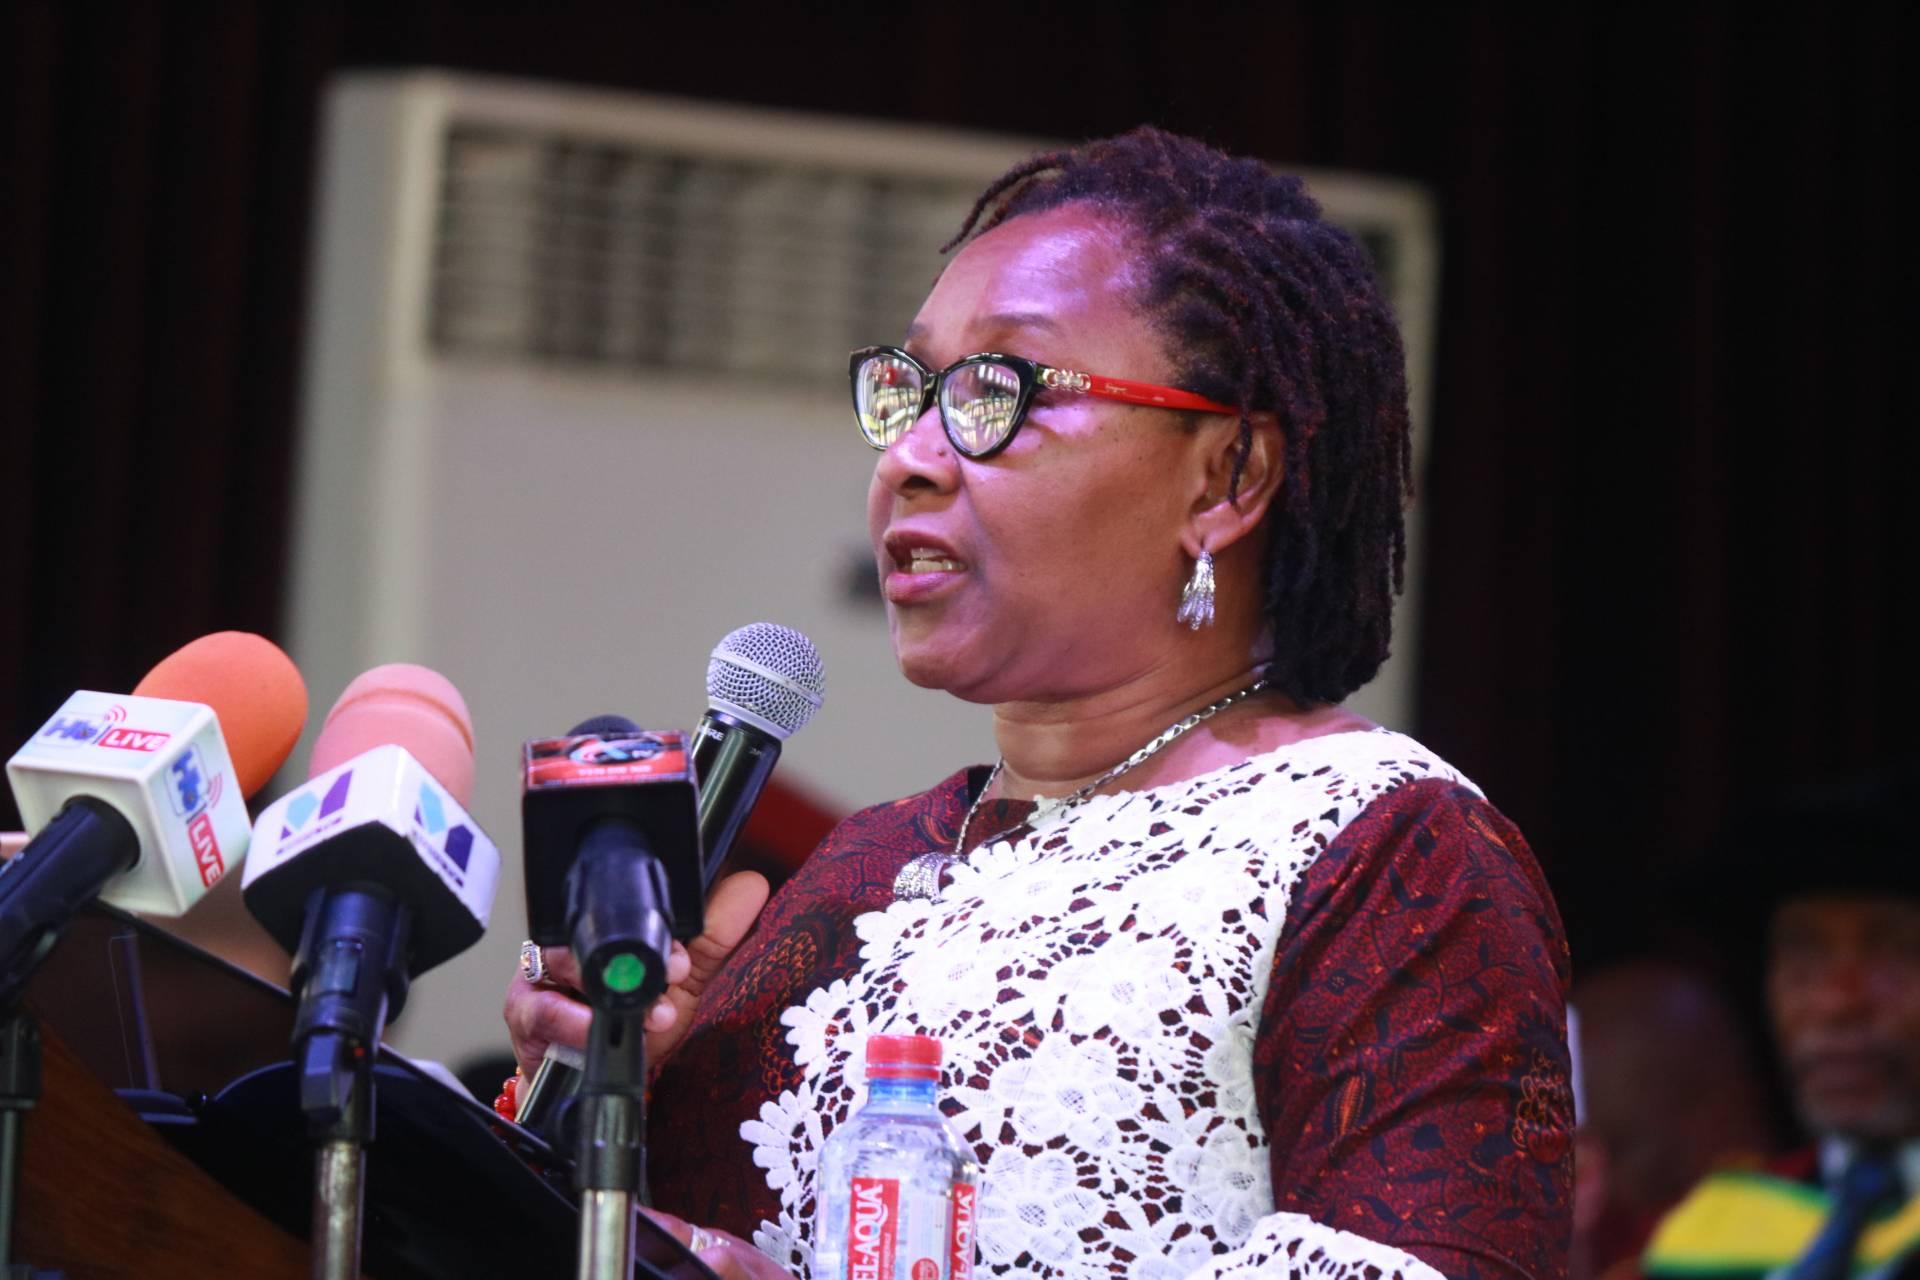 INCREASING ENROLMENT OF WOMEN IN UNIVERSITY IMPRESSIVE BUT OPPORTUNITIES FOR MEN ALSO MATTER- DR. EGBUNA.